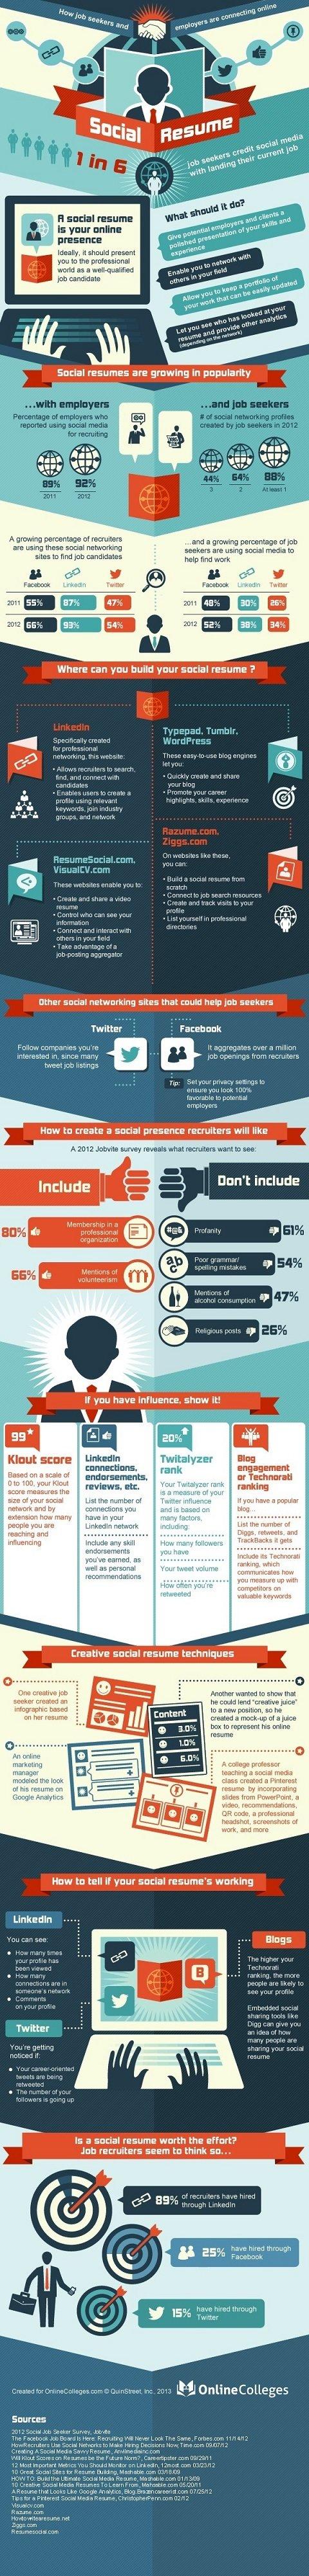 Land Your Next Job Using Social Media #SMM #infographic